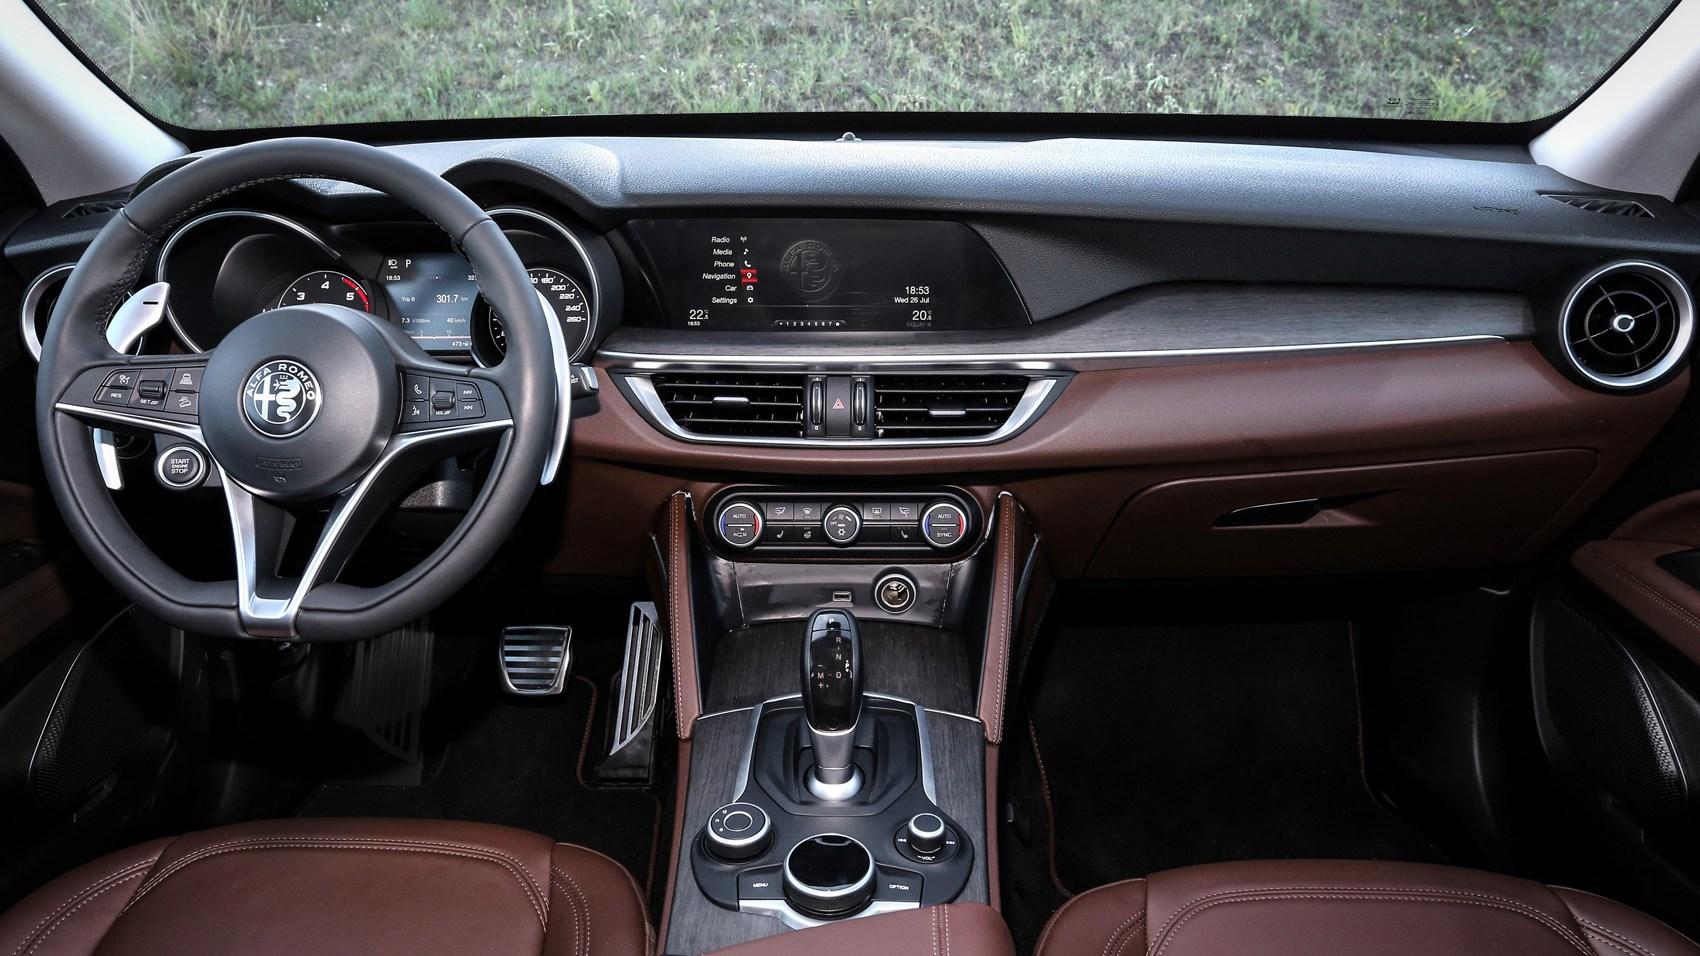 Alfa romeo stelvio 2017 review by car magazine for Alfa romeo stelvio interior dimensions